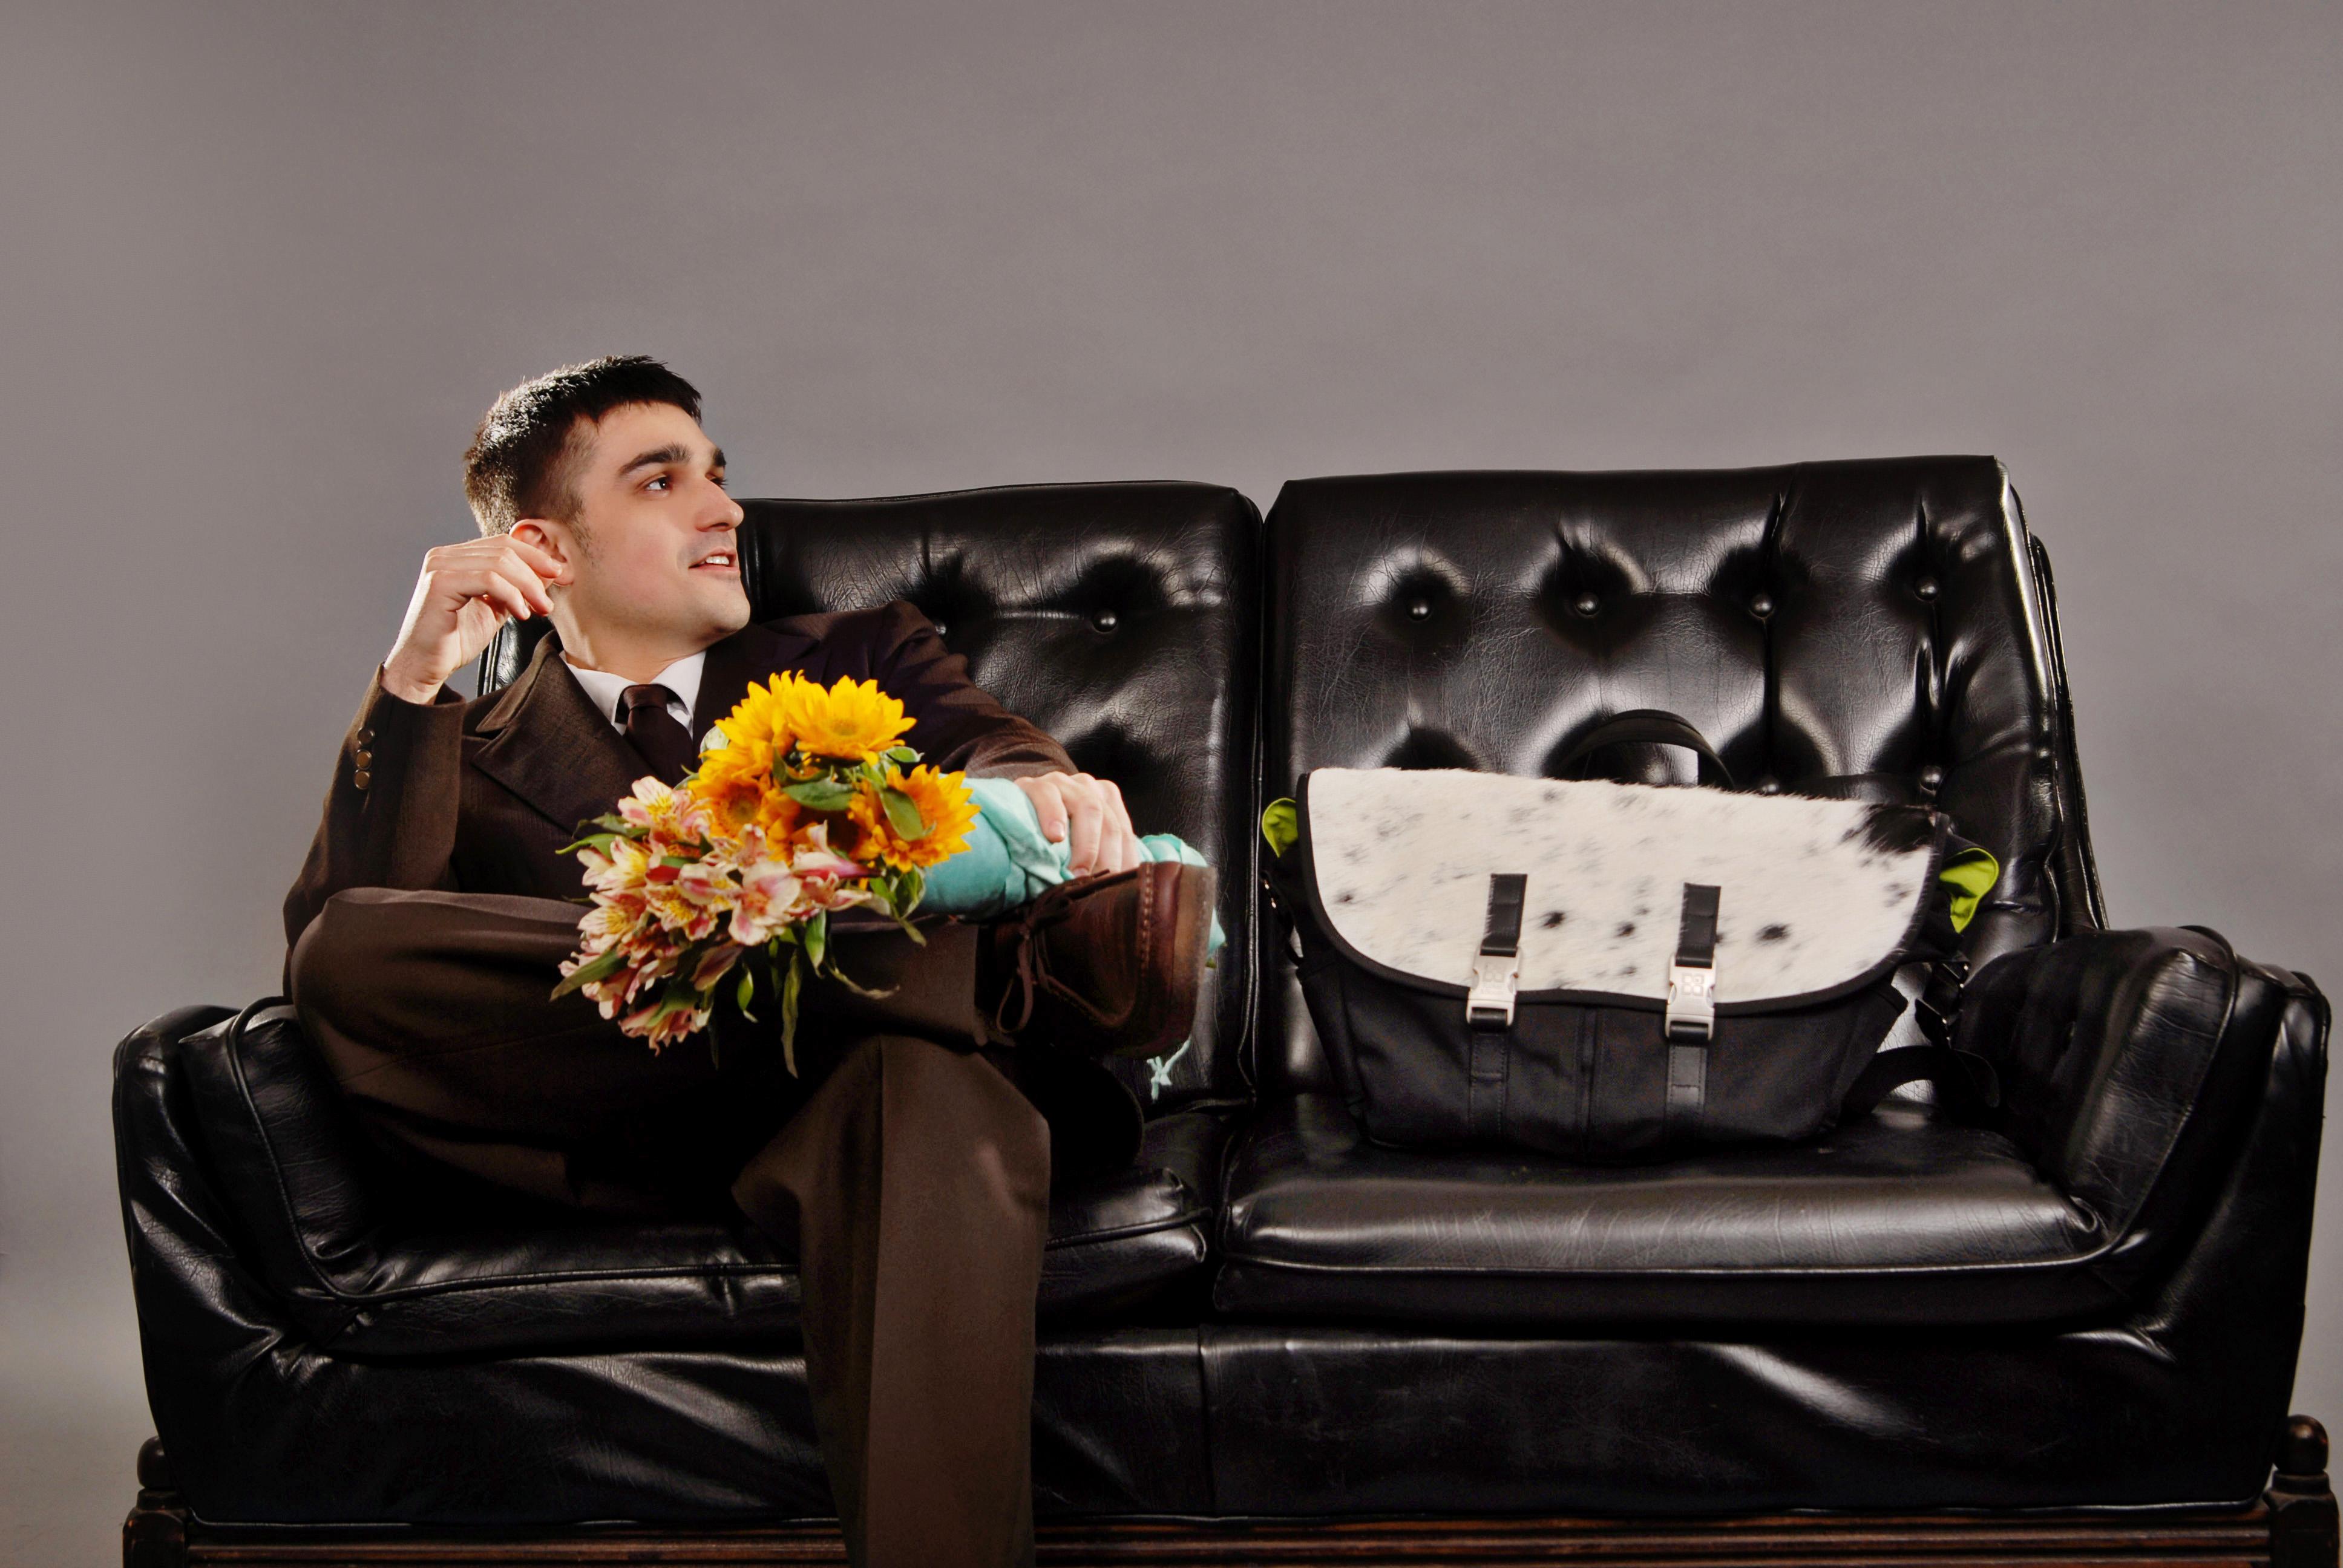 amerigo_gazaway_press_couch